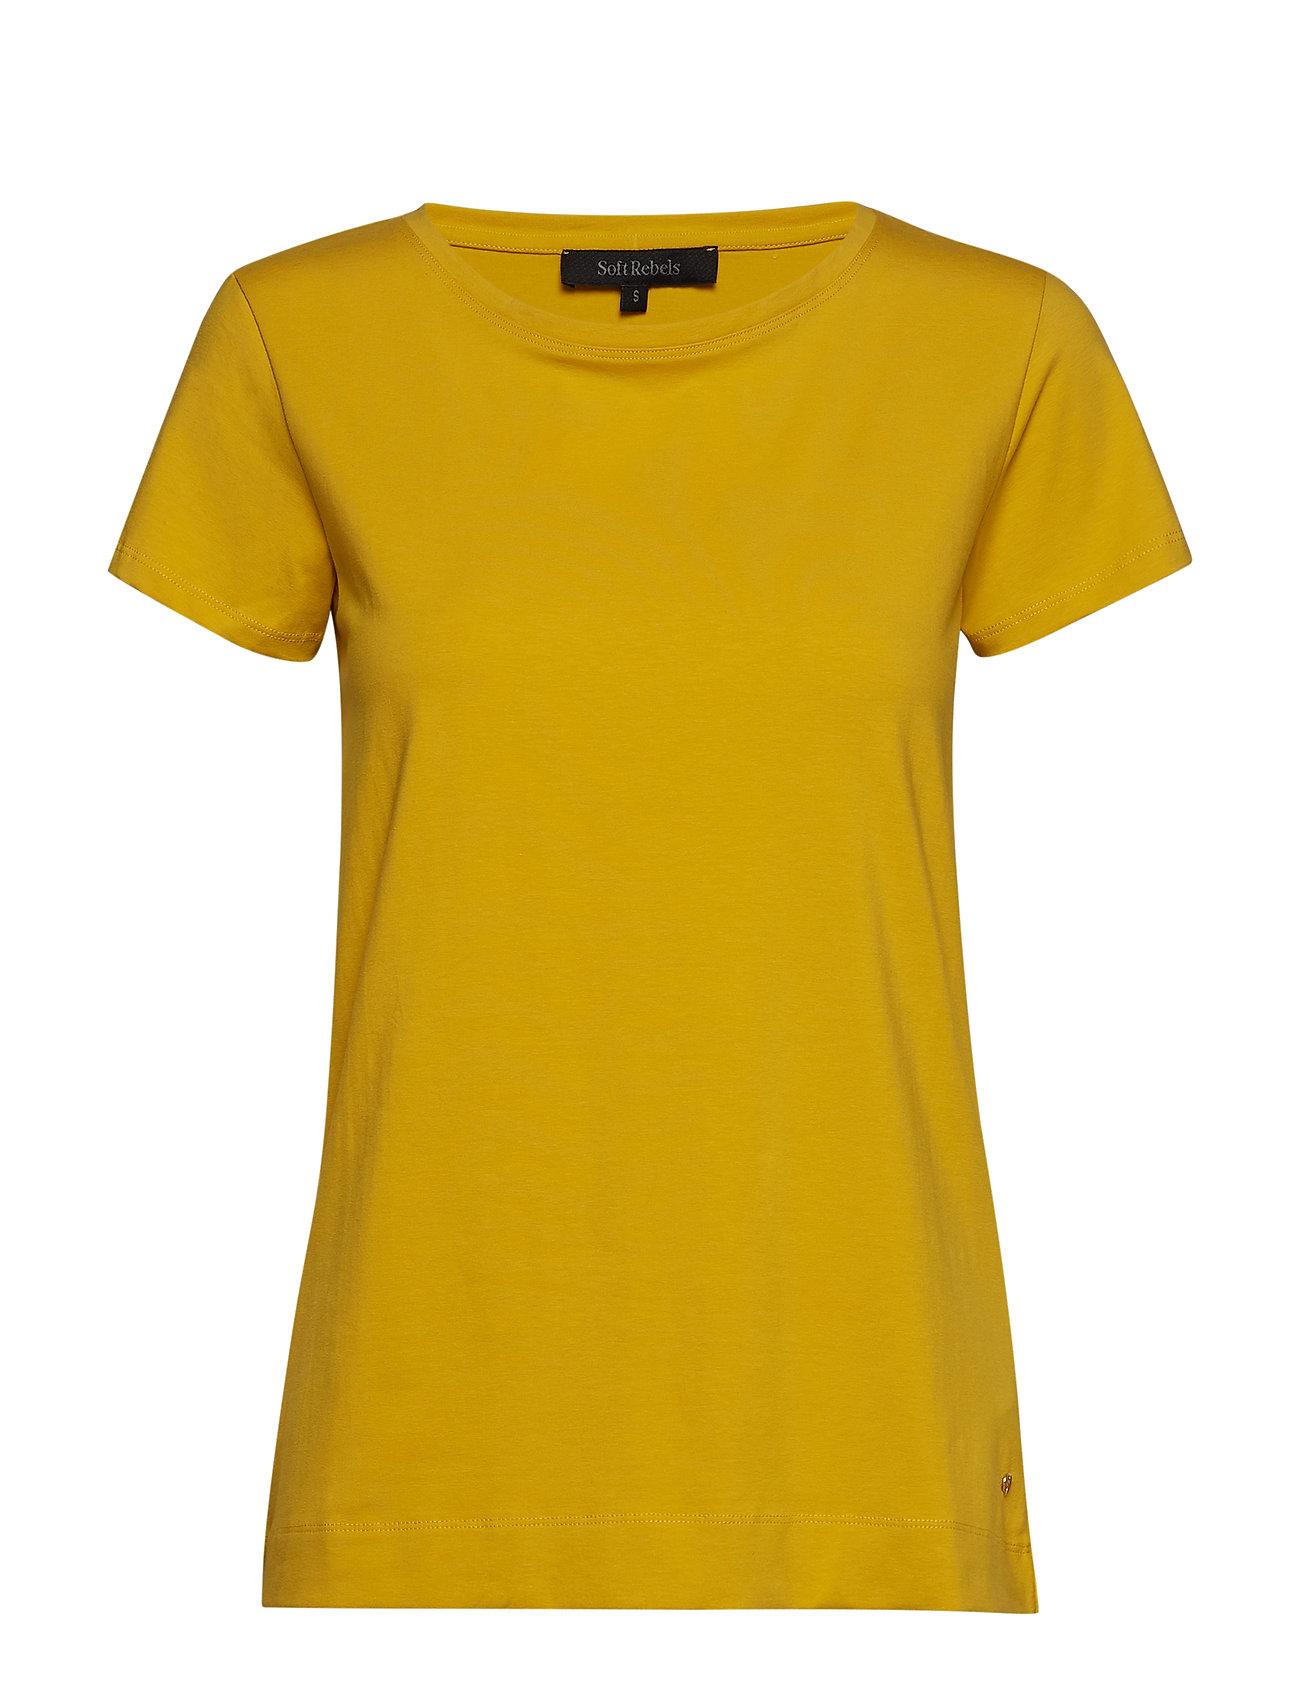 Soft Rebels Elle T-shirt - CEYLON YELLOW